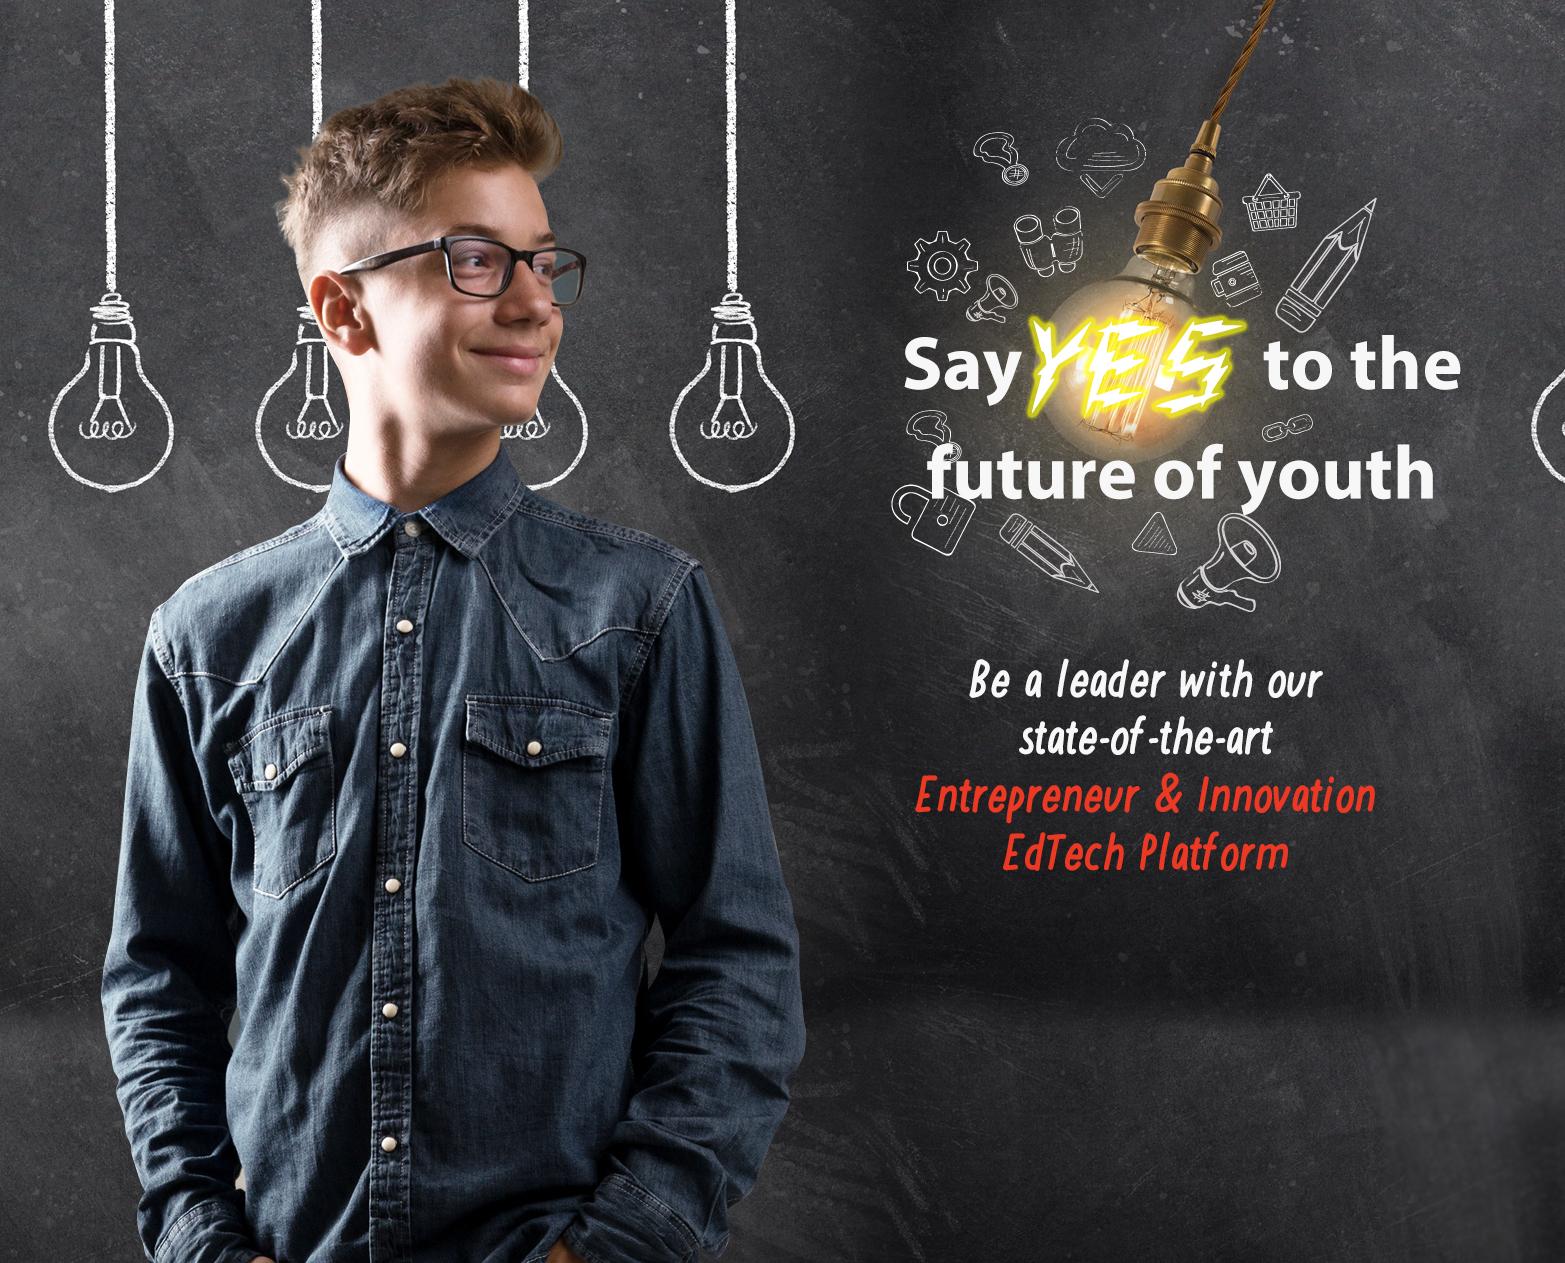 Entrepreneur & Innovation EdTech Platform